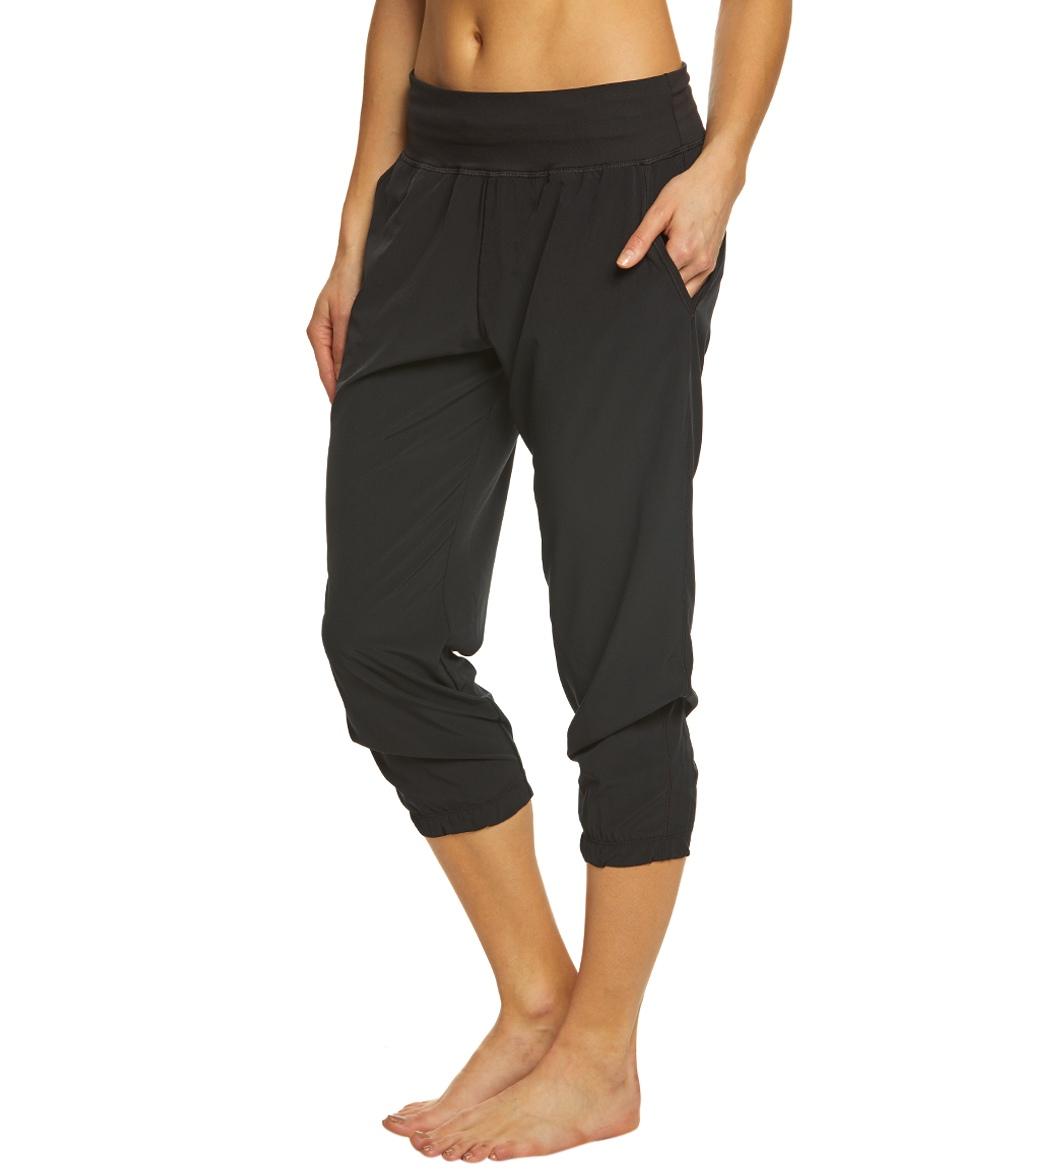 Under Armour Women s UA HeatGear Sunblock 50 Pants at SwimOutlet.com - Free  Shipping f3b0bfbf4e